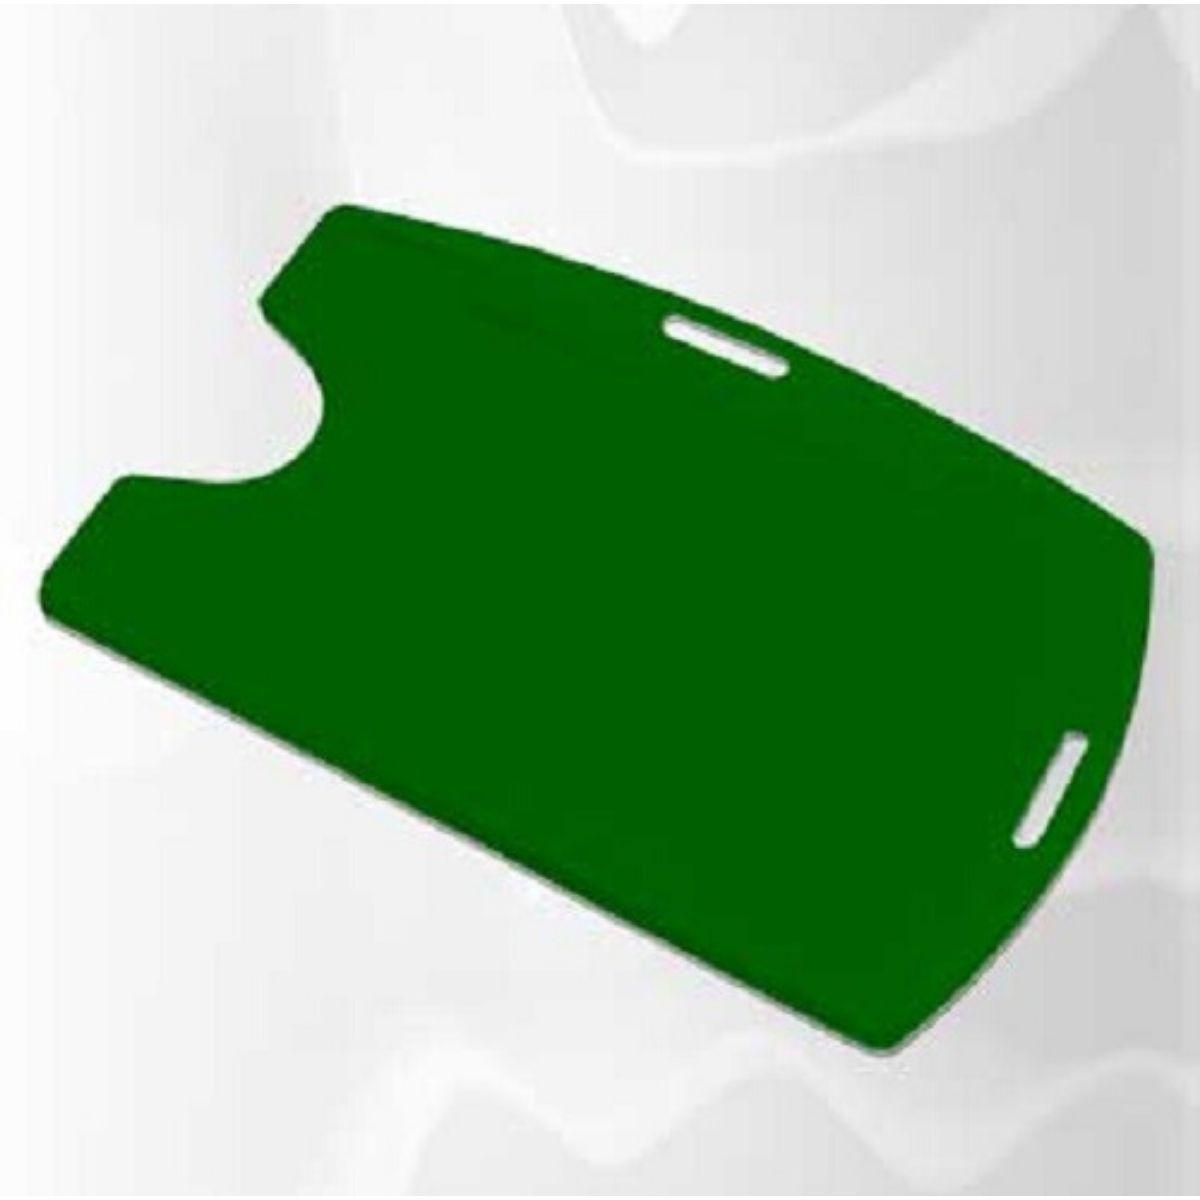 Kit 1000 Protetores Porta Crachá Rígido M3 Conjugado Verde  - Click Suprimentos